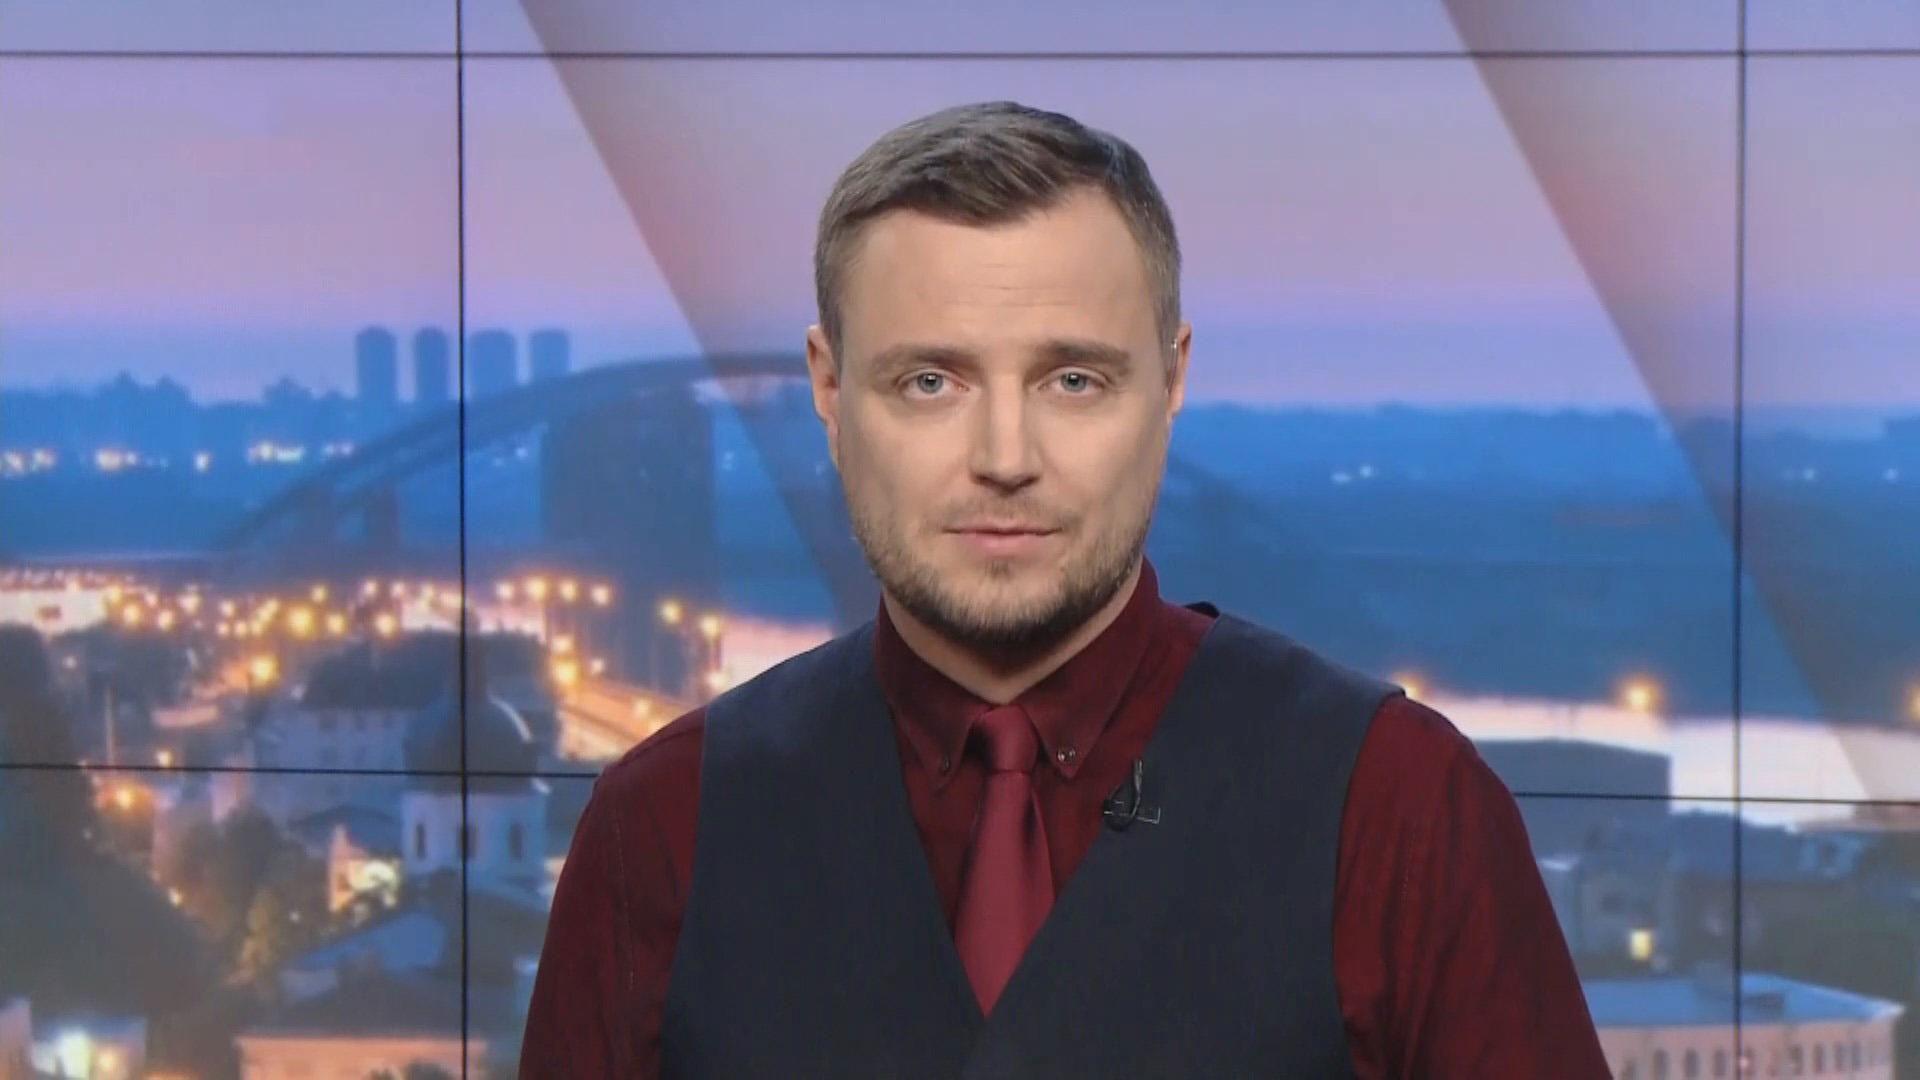 Pro новости: Европа против коронавируса. Видеофиксация нарушений на Киевщине - Новости Киева - 24 Канал